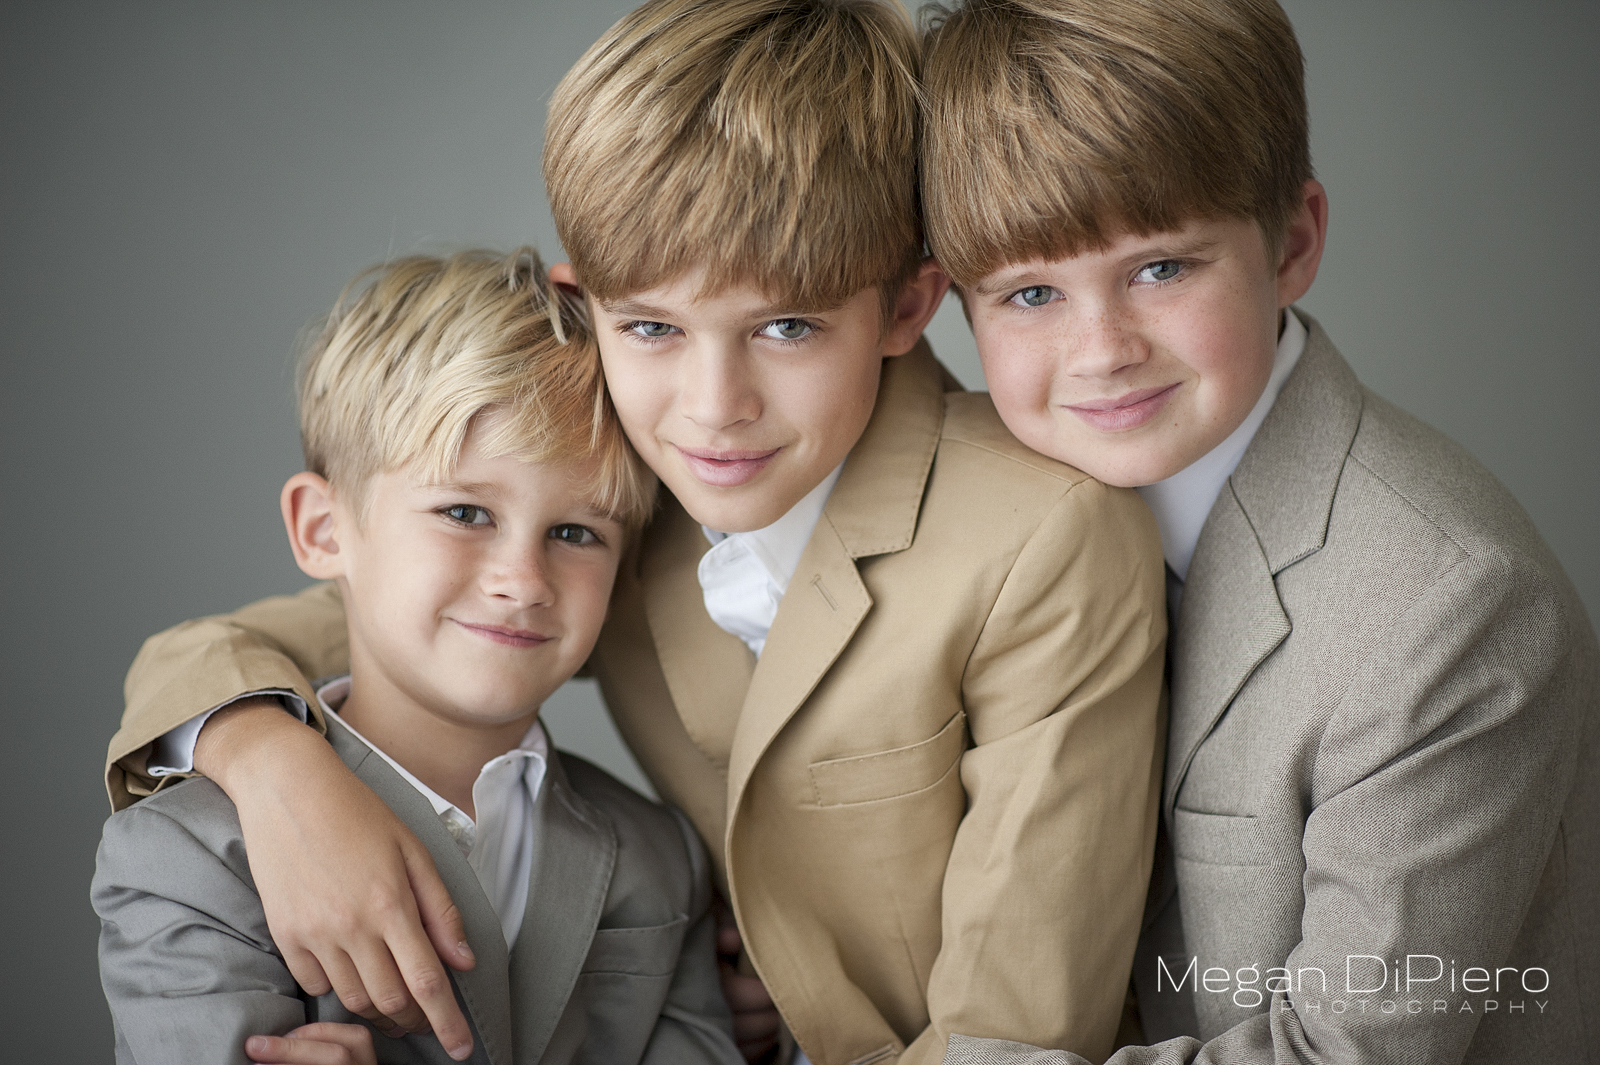 Megan DiPiero Photography {Beautiful You, Beautiful Family}